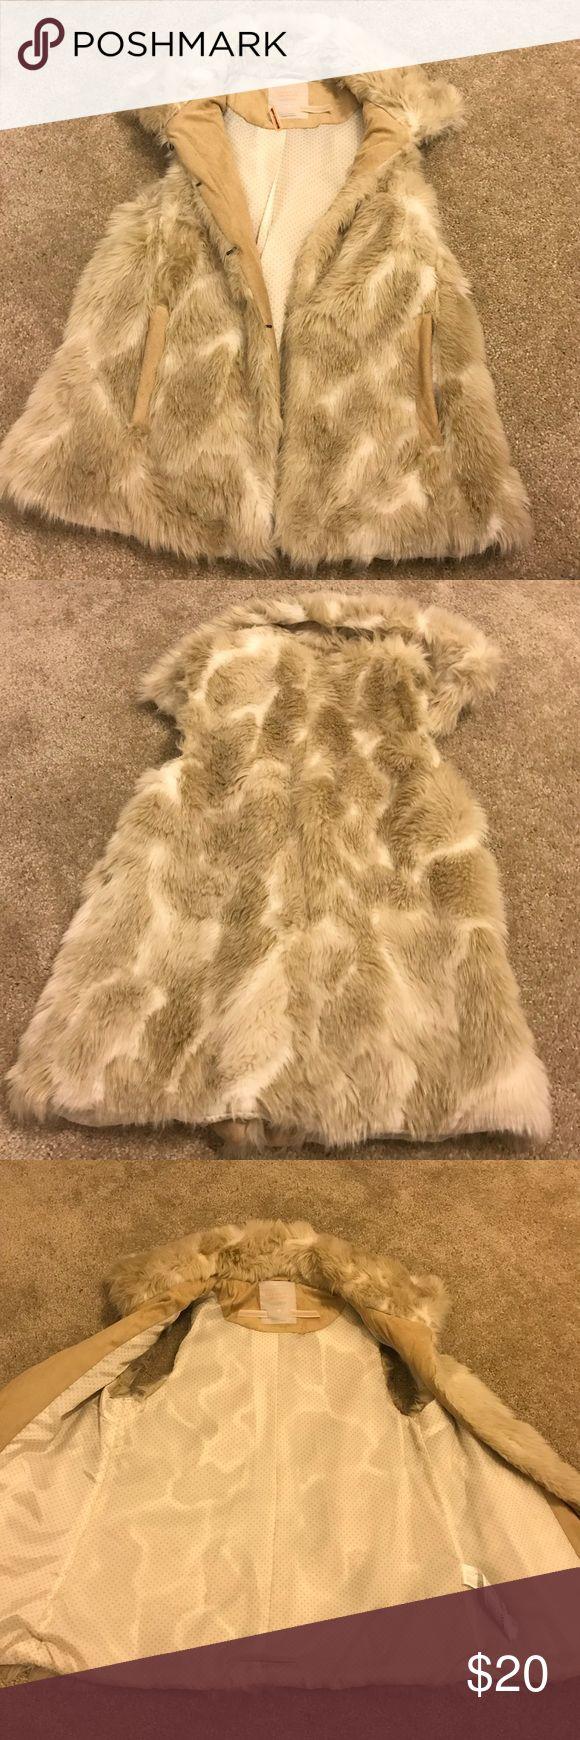 Tan Fur Vest Tan Fur Vest. Like new. Smoke & Pet Free Home. Sizing says (EUR: L/ MEX: 30) I would say its an XS or S ( run small) Bershka Jackets & Coats Vests